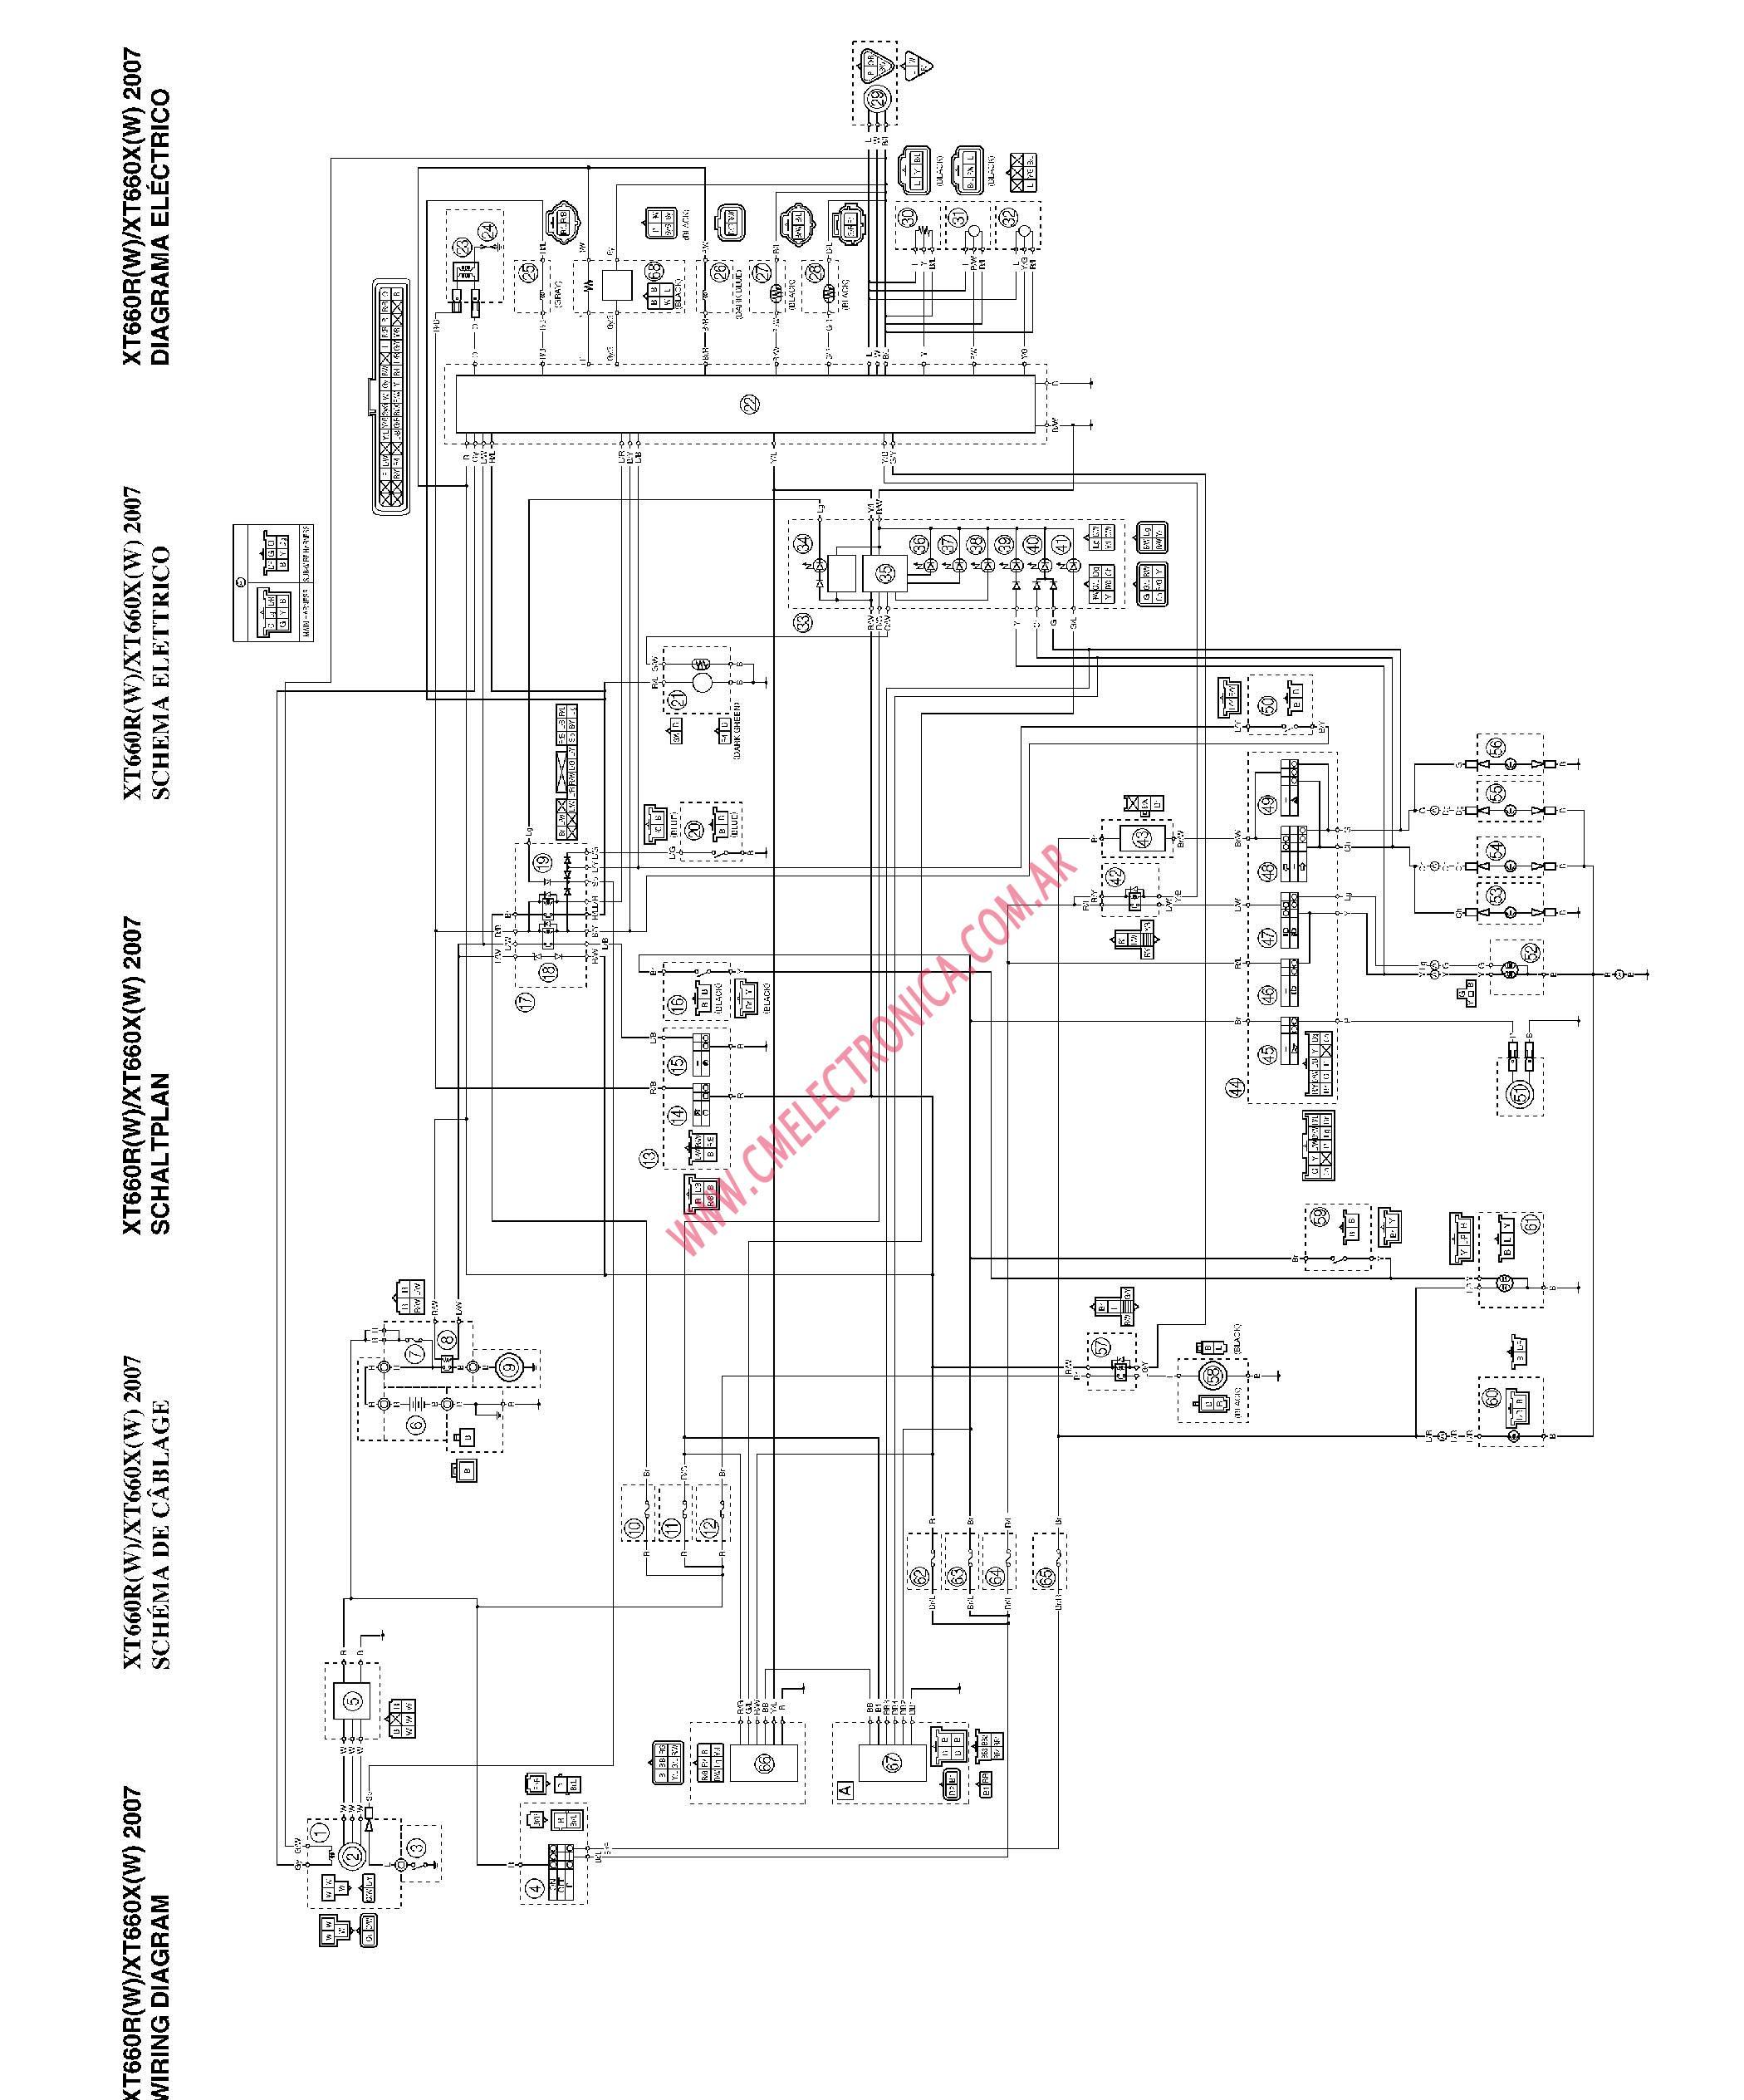 King Quad 700 Wiring Diagram Free For You 06 Gsxr Rectifier Regulator 2007 Suzuki 40